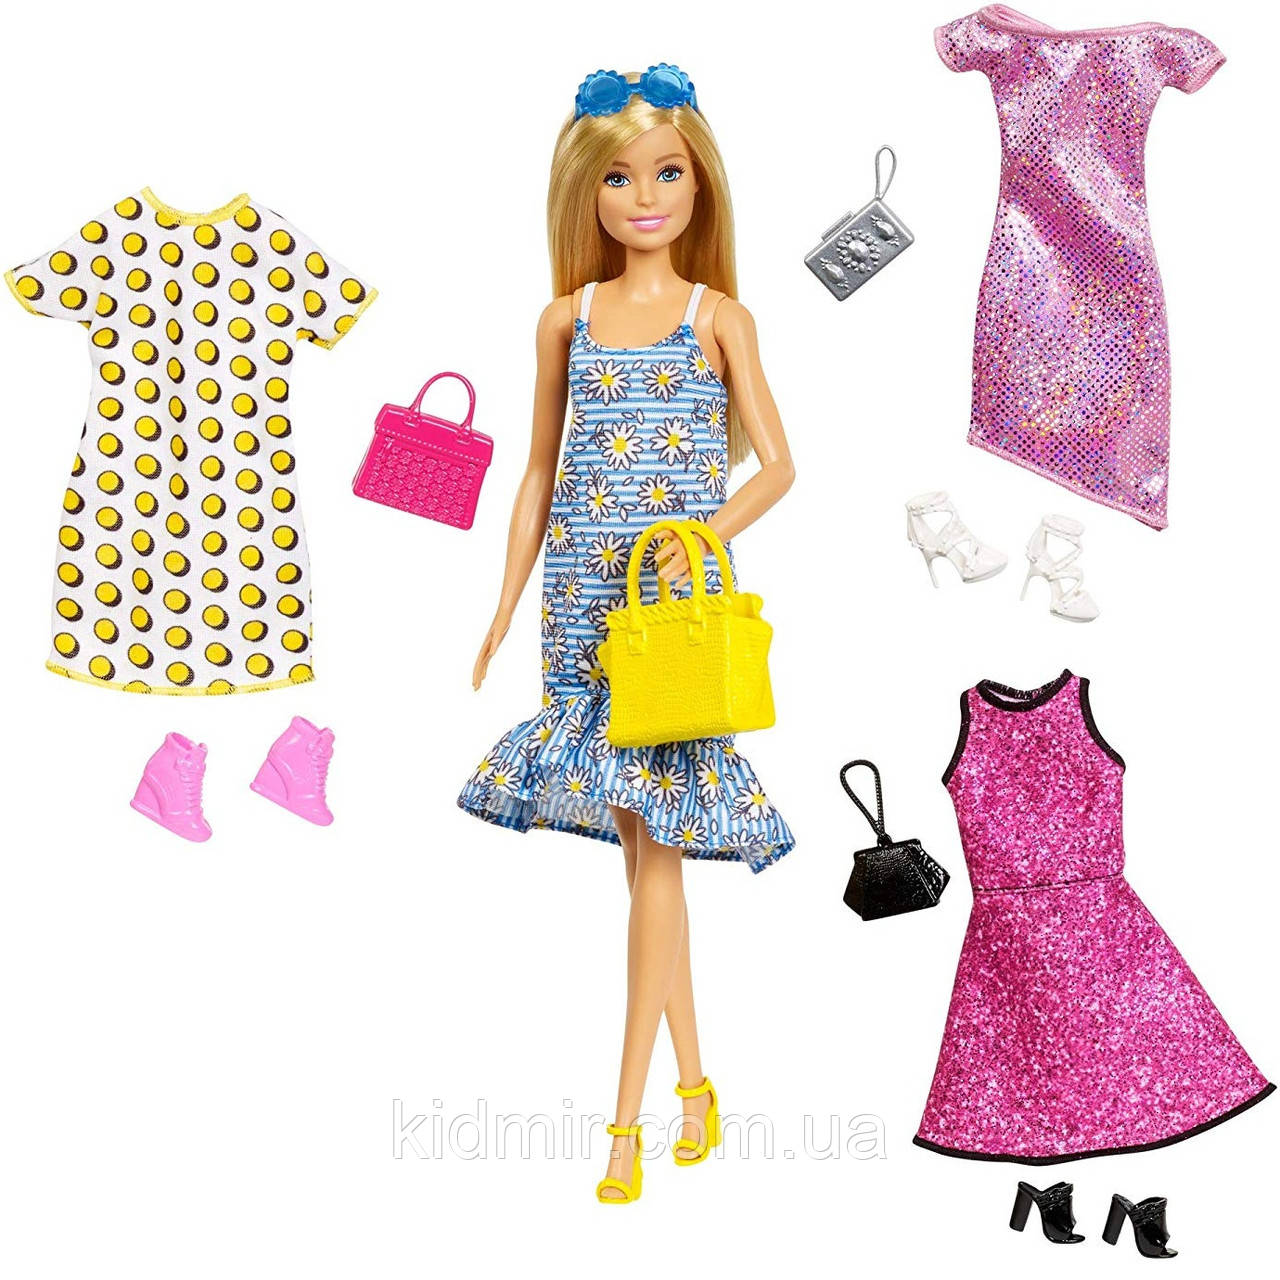 Кукла Барби Модница с одеждой и аксессуарами Barbie Fashions GDJ40